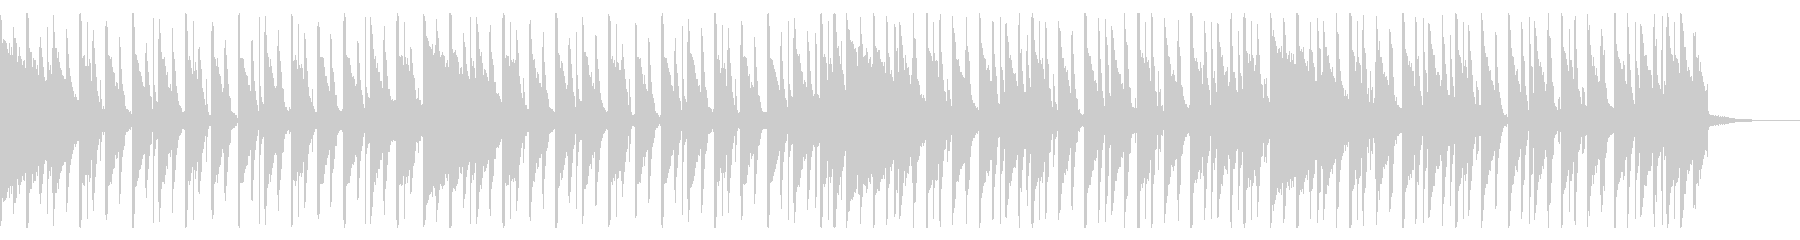 125 BPMの未再生の波形